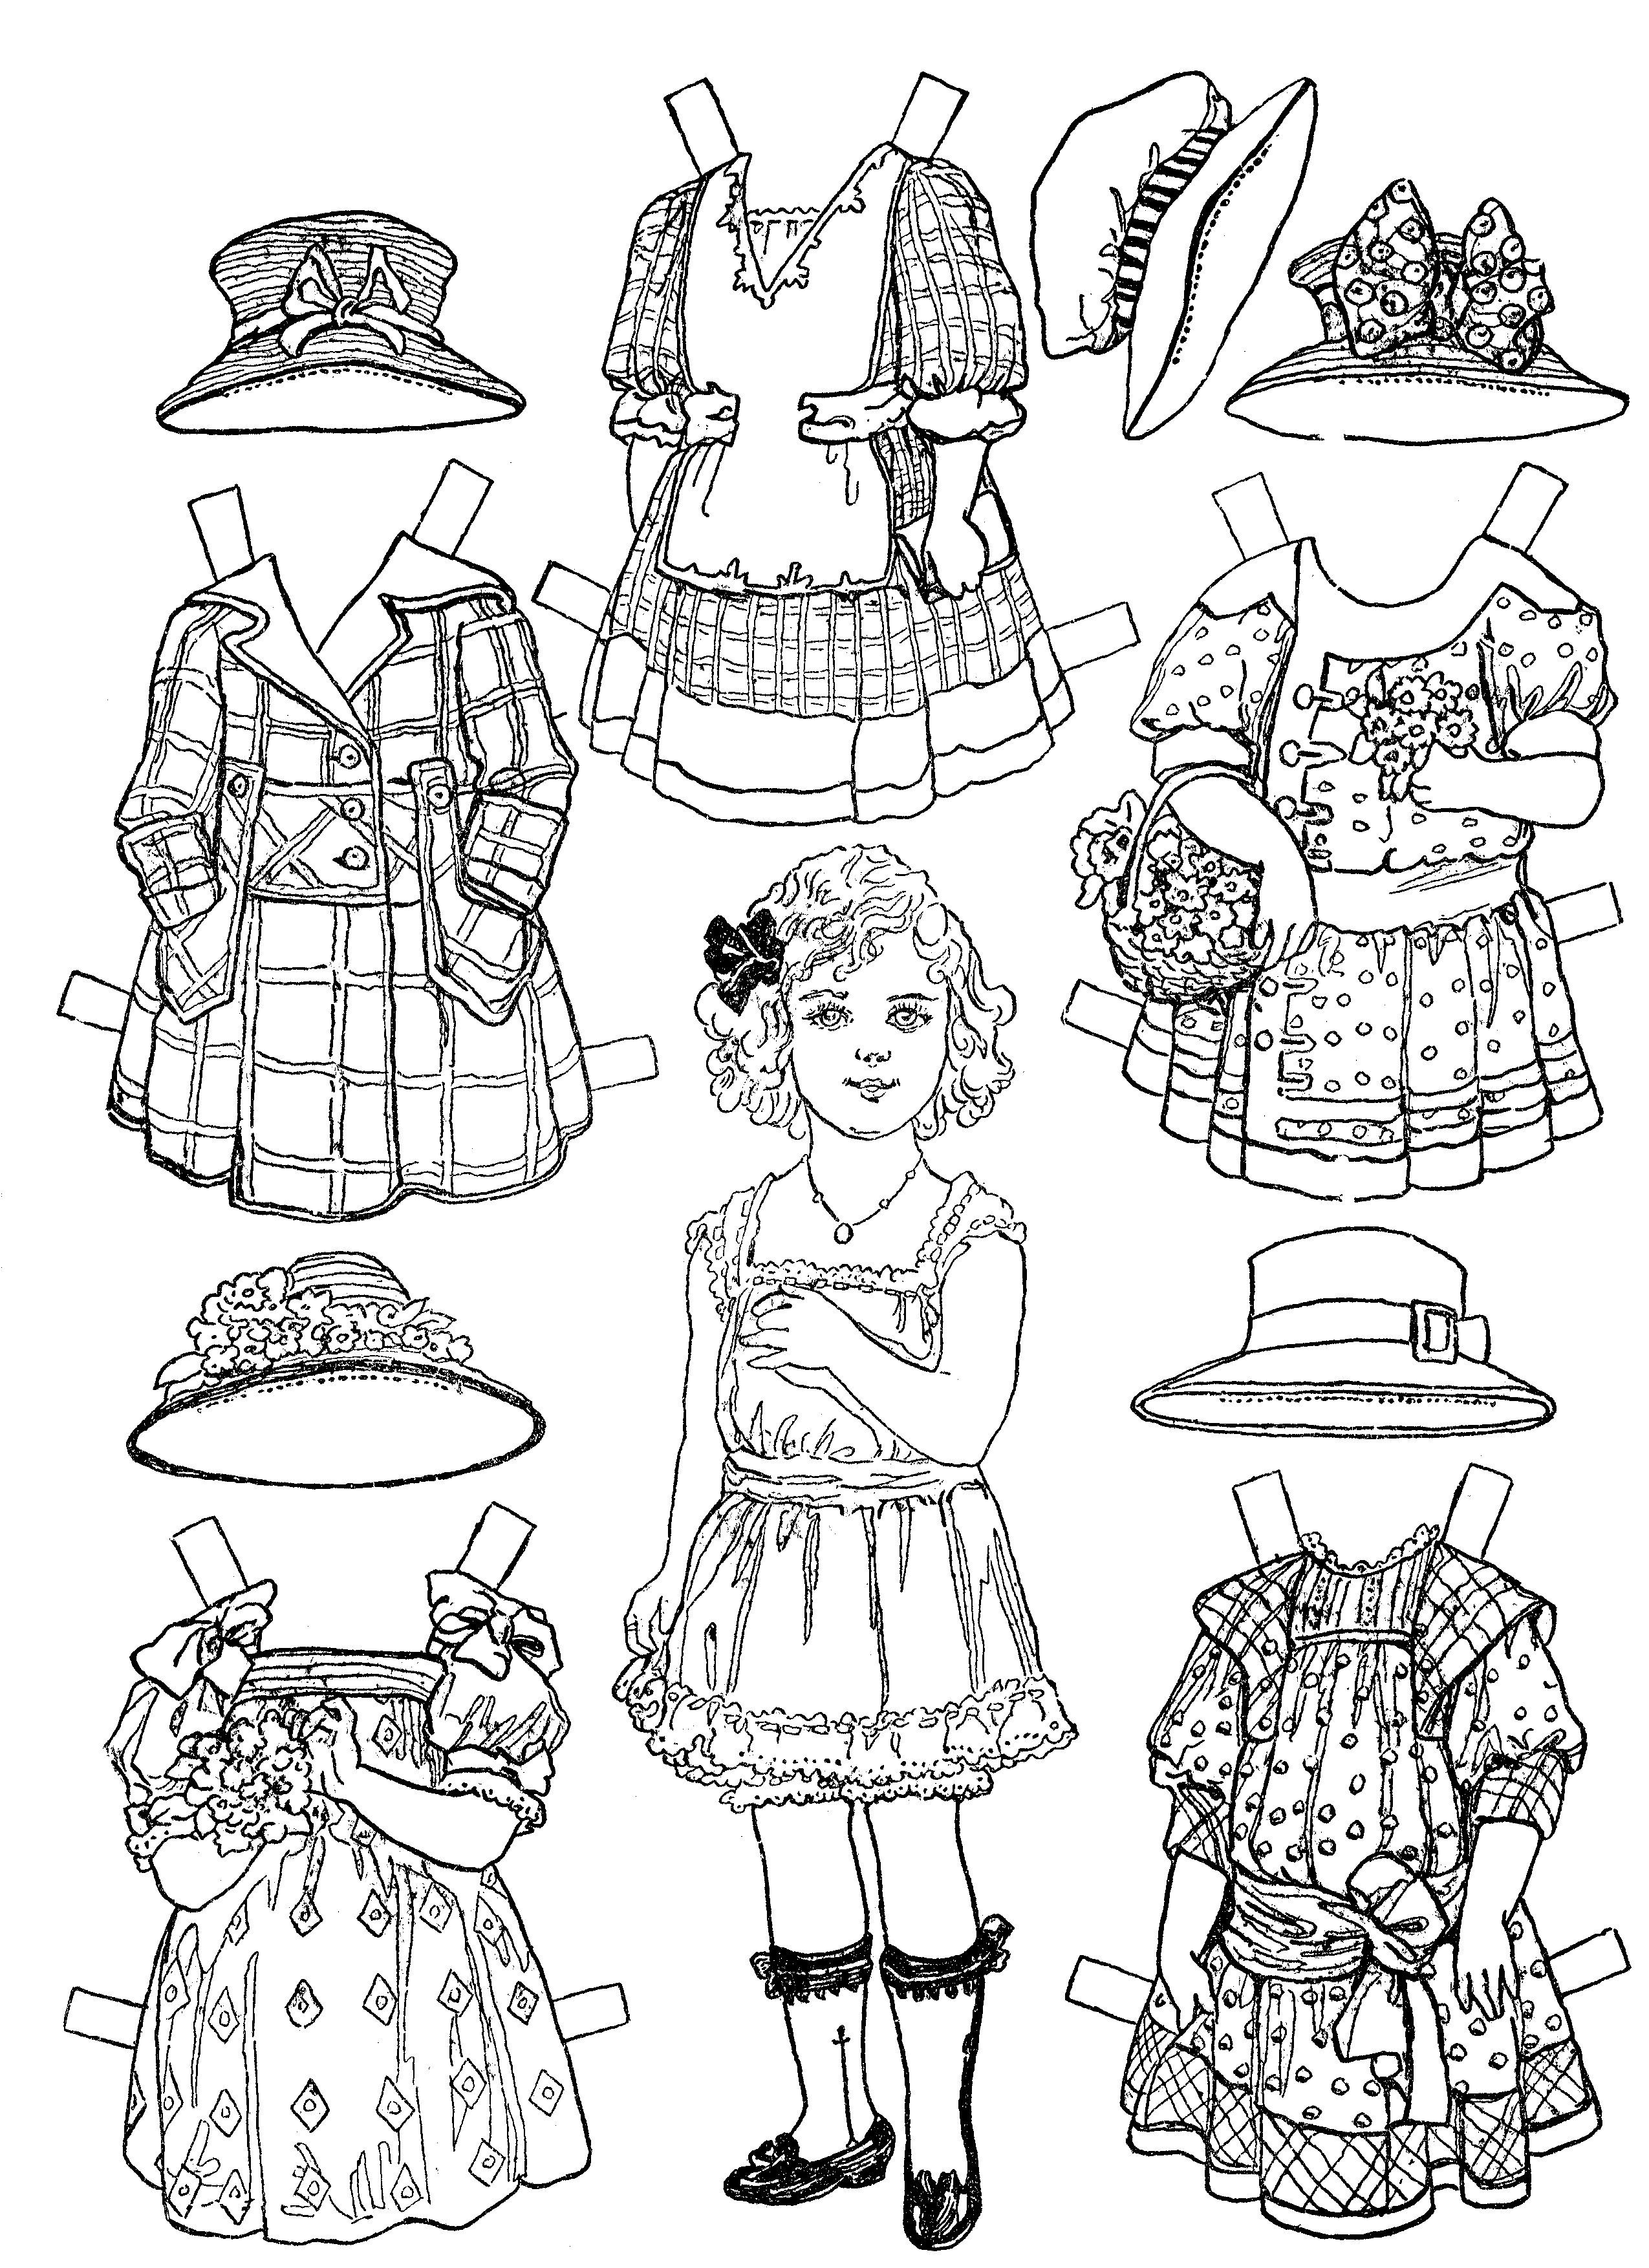 printable dress up paper dolls berusdankrayonkami paper doll up dress dolls printable paper